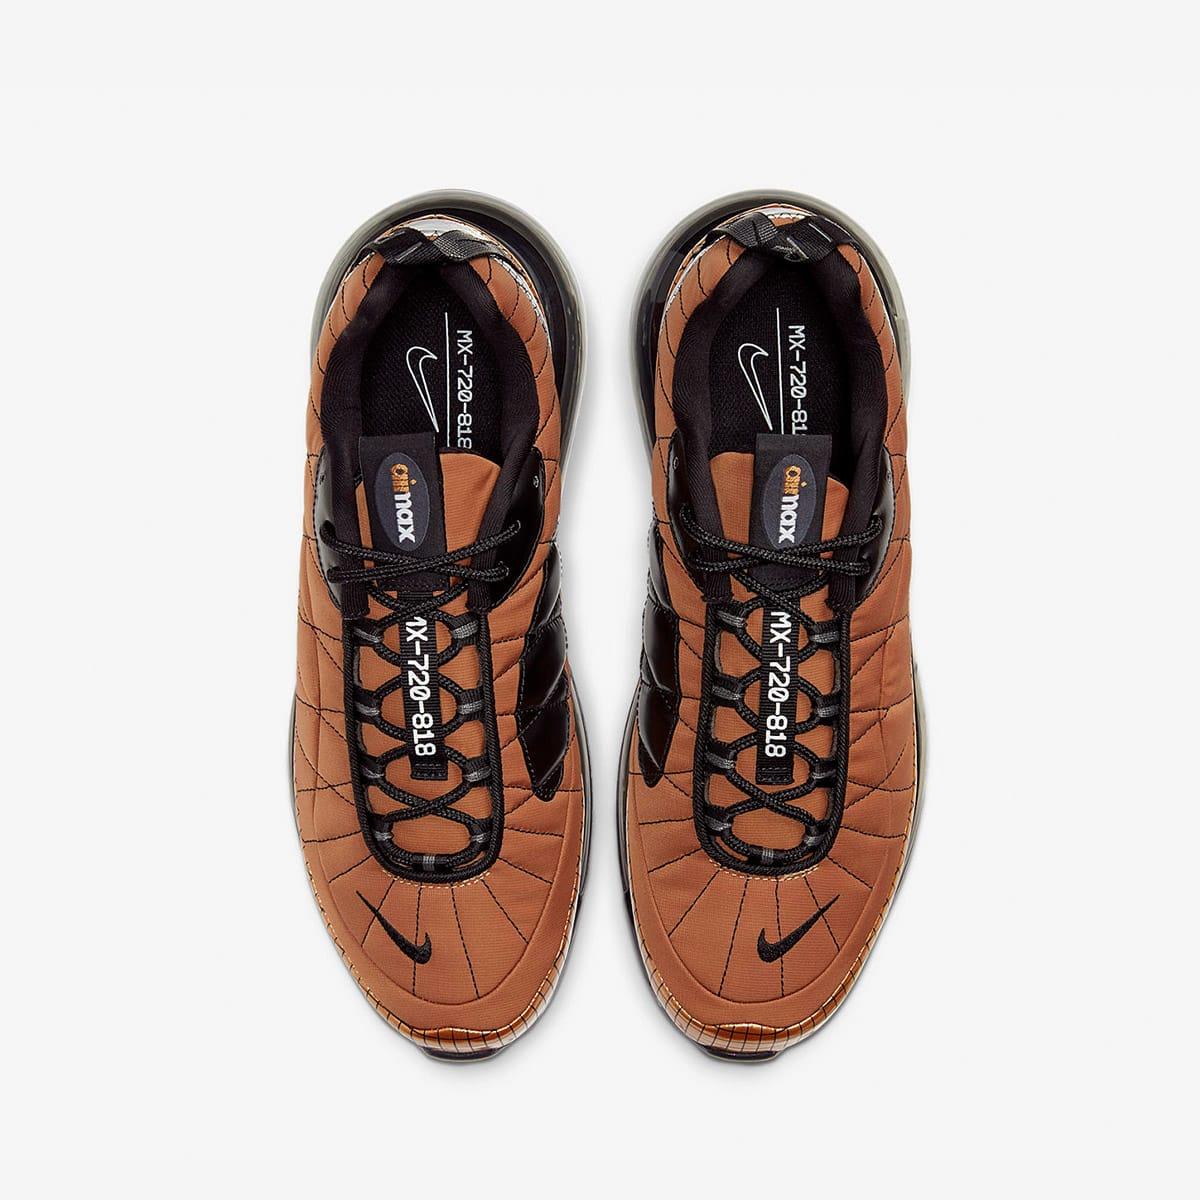 Nike Air Max 720-818 - BV5841-800